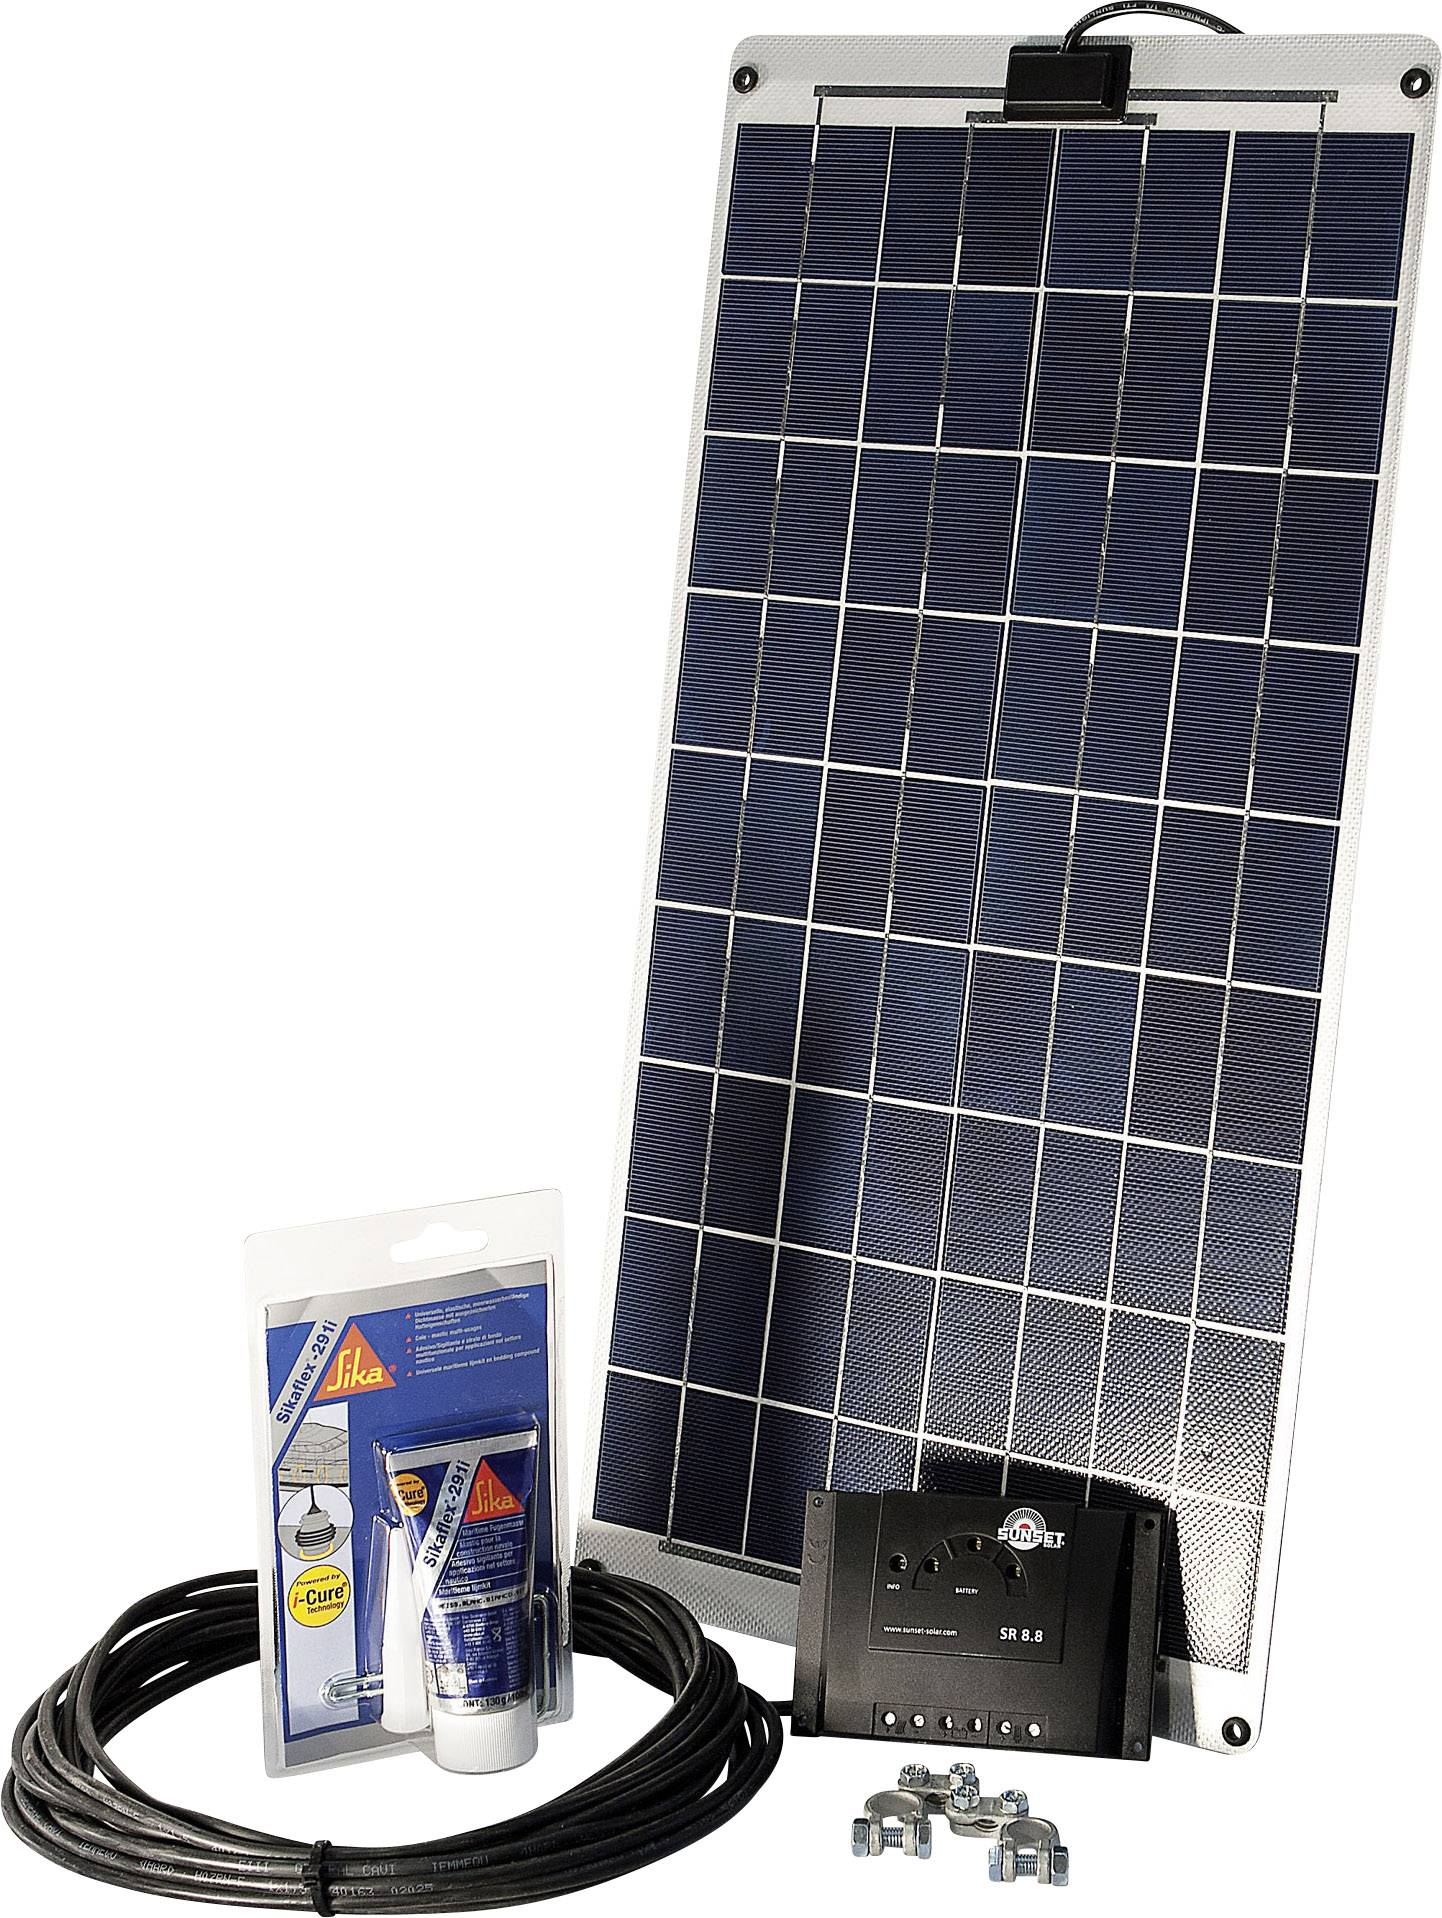 Solárna sada Sunset SM 30L 110262, 30 Wp, vr. nabíjacieho regulátora, vr. kábla